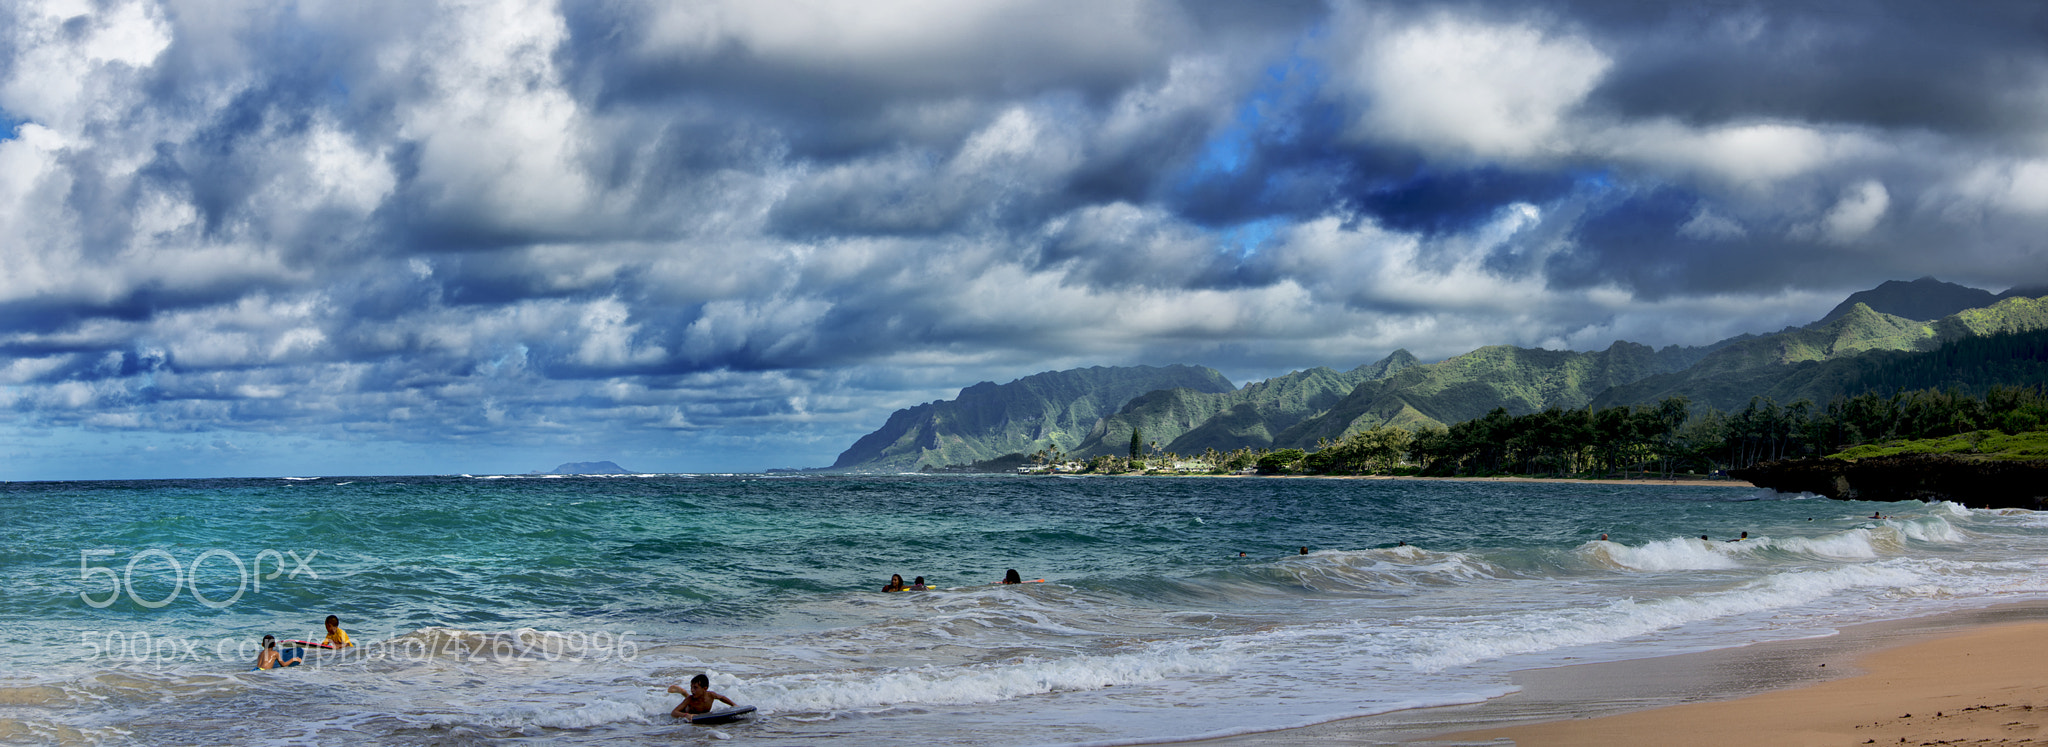 Photograph Sun n Surf by NicholasL on 500px